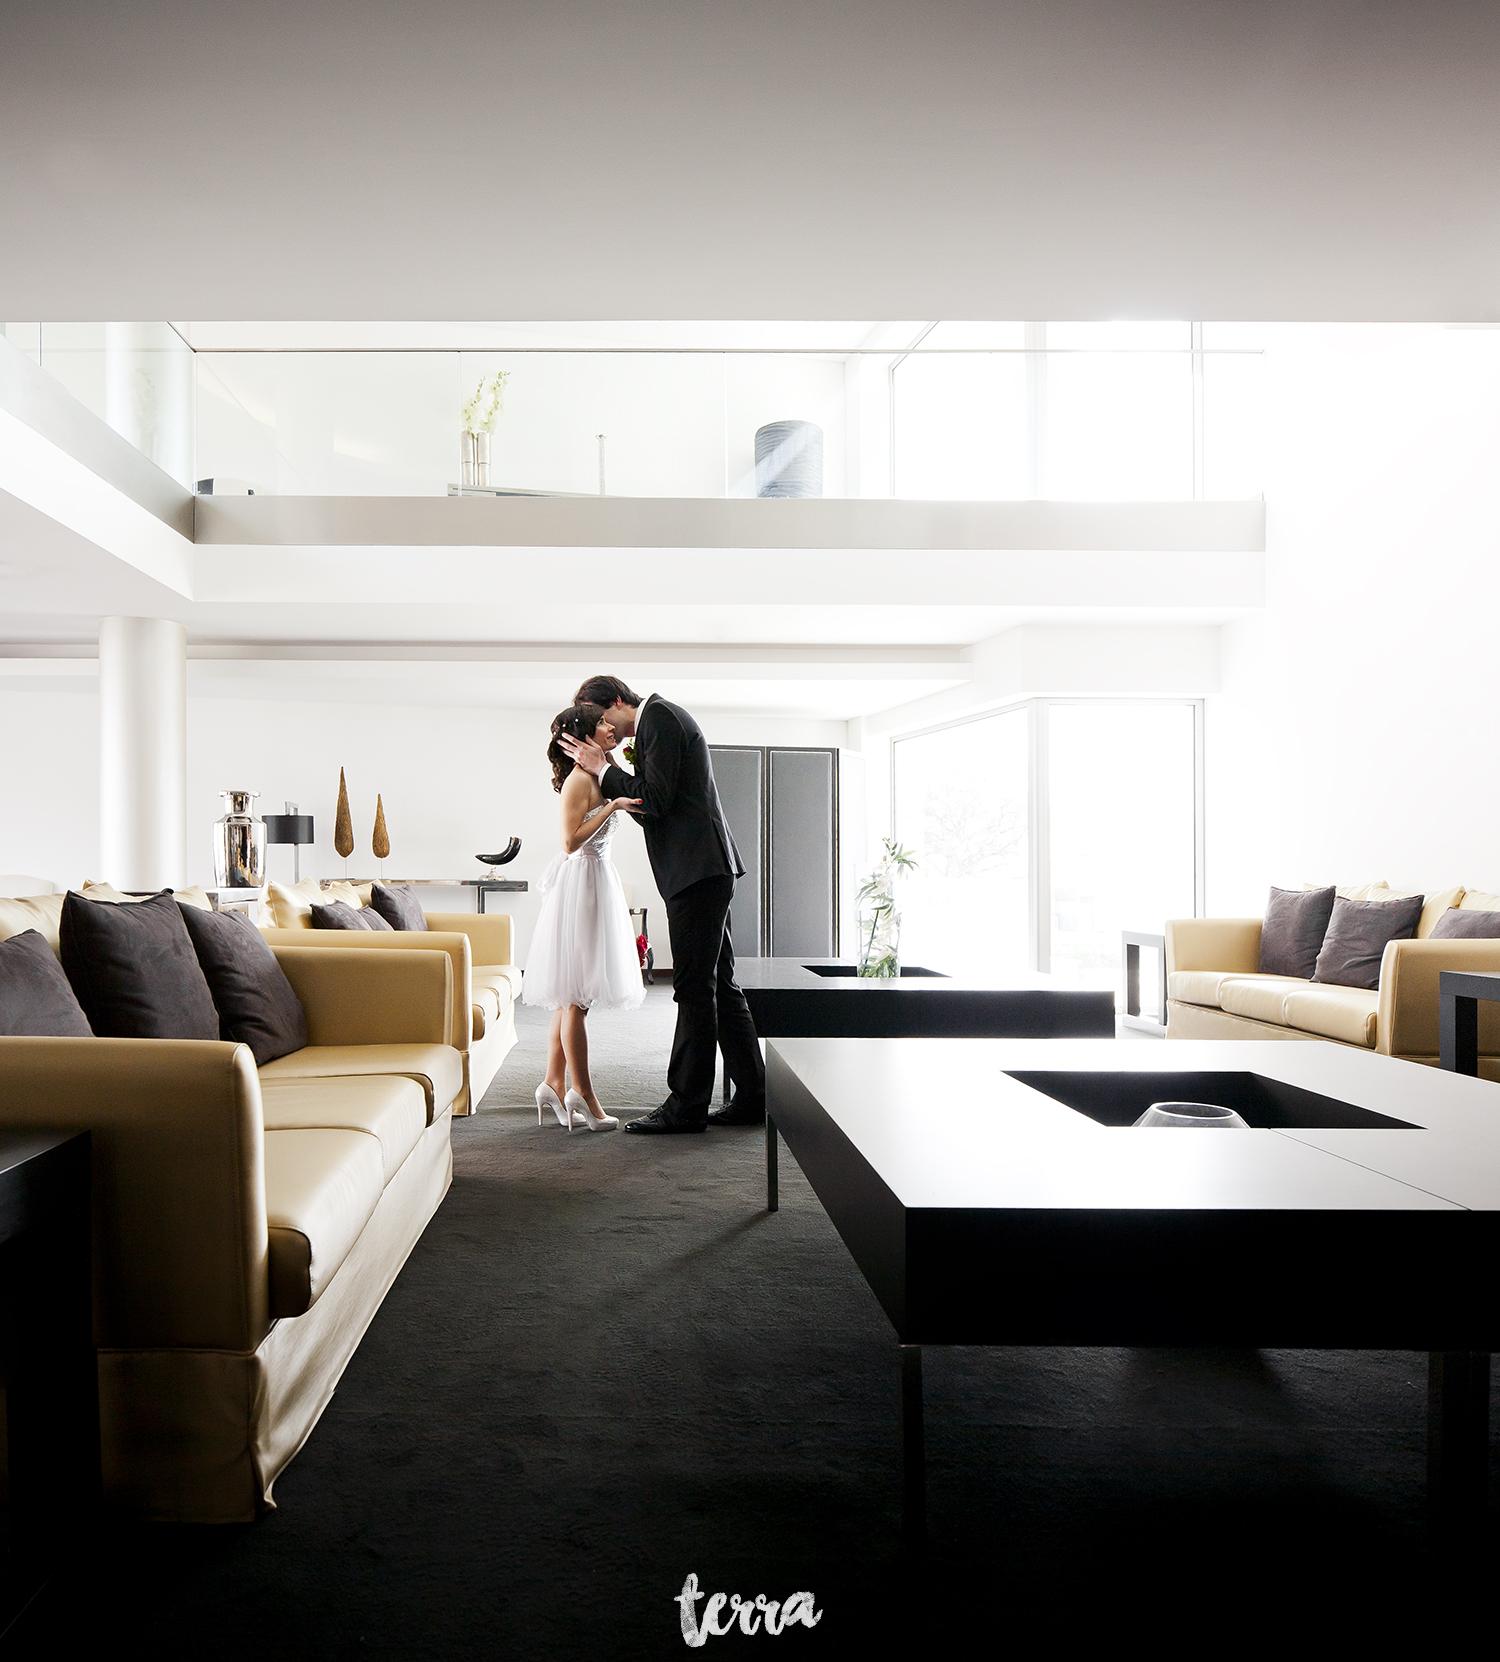 casamento-monte-real-termas-hotel-spa-terra-fotografia-0017.jpg